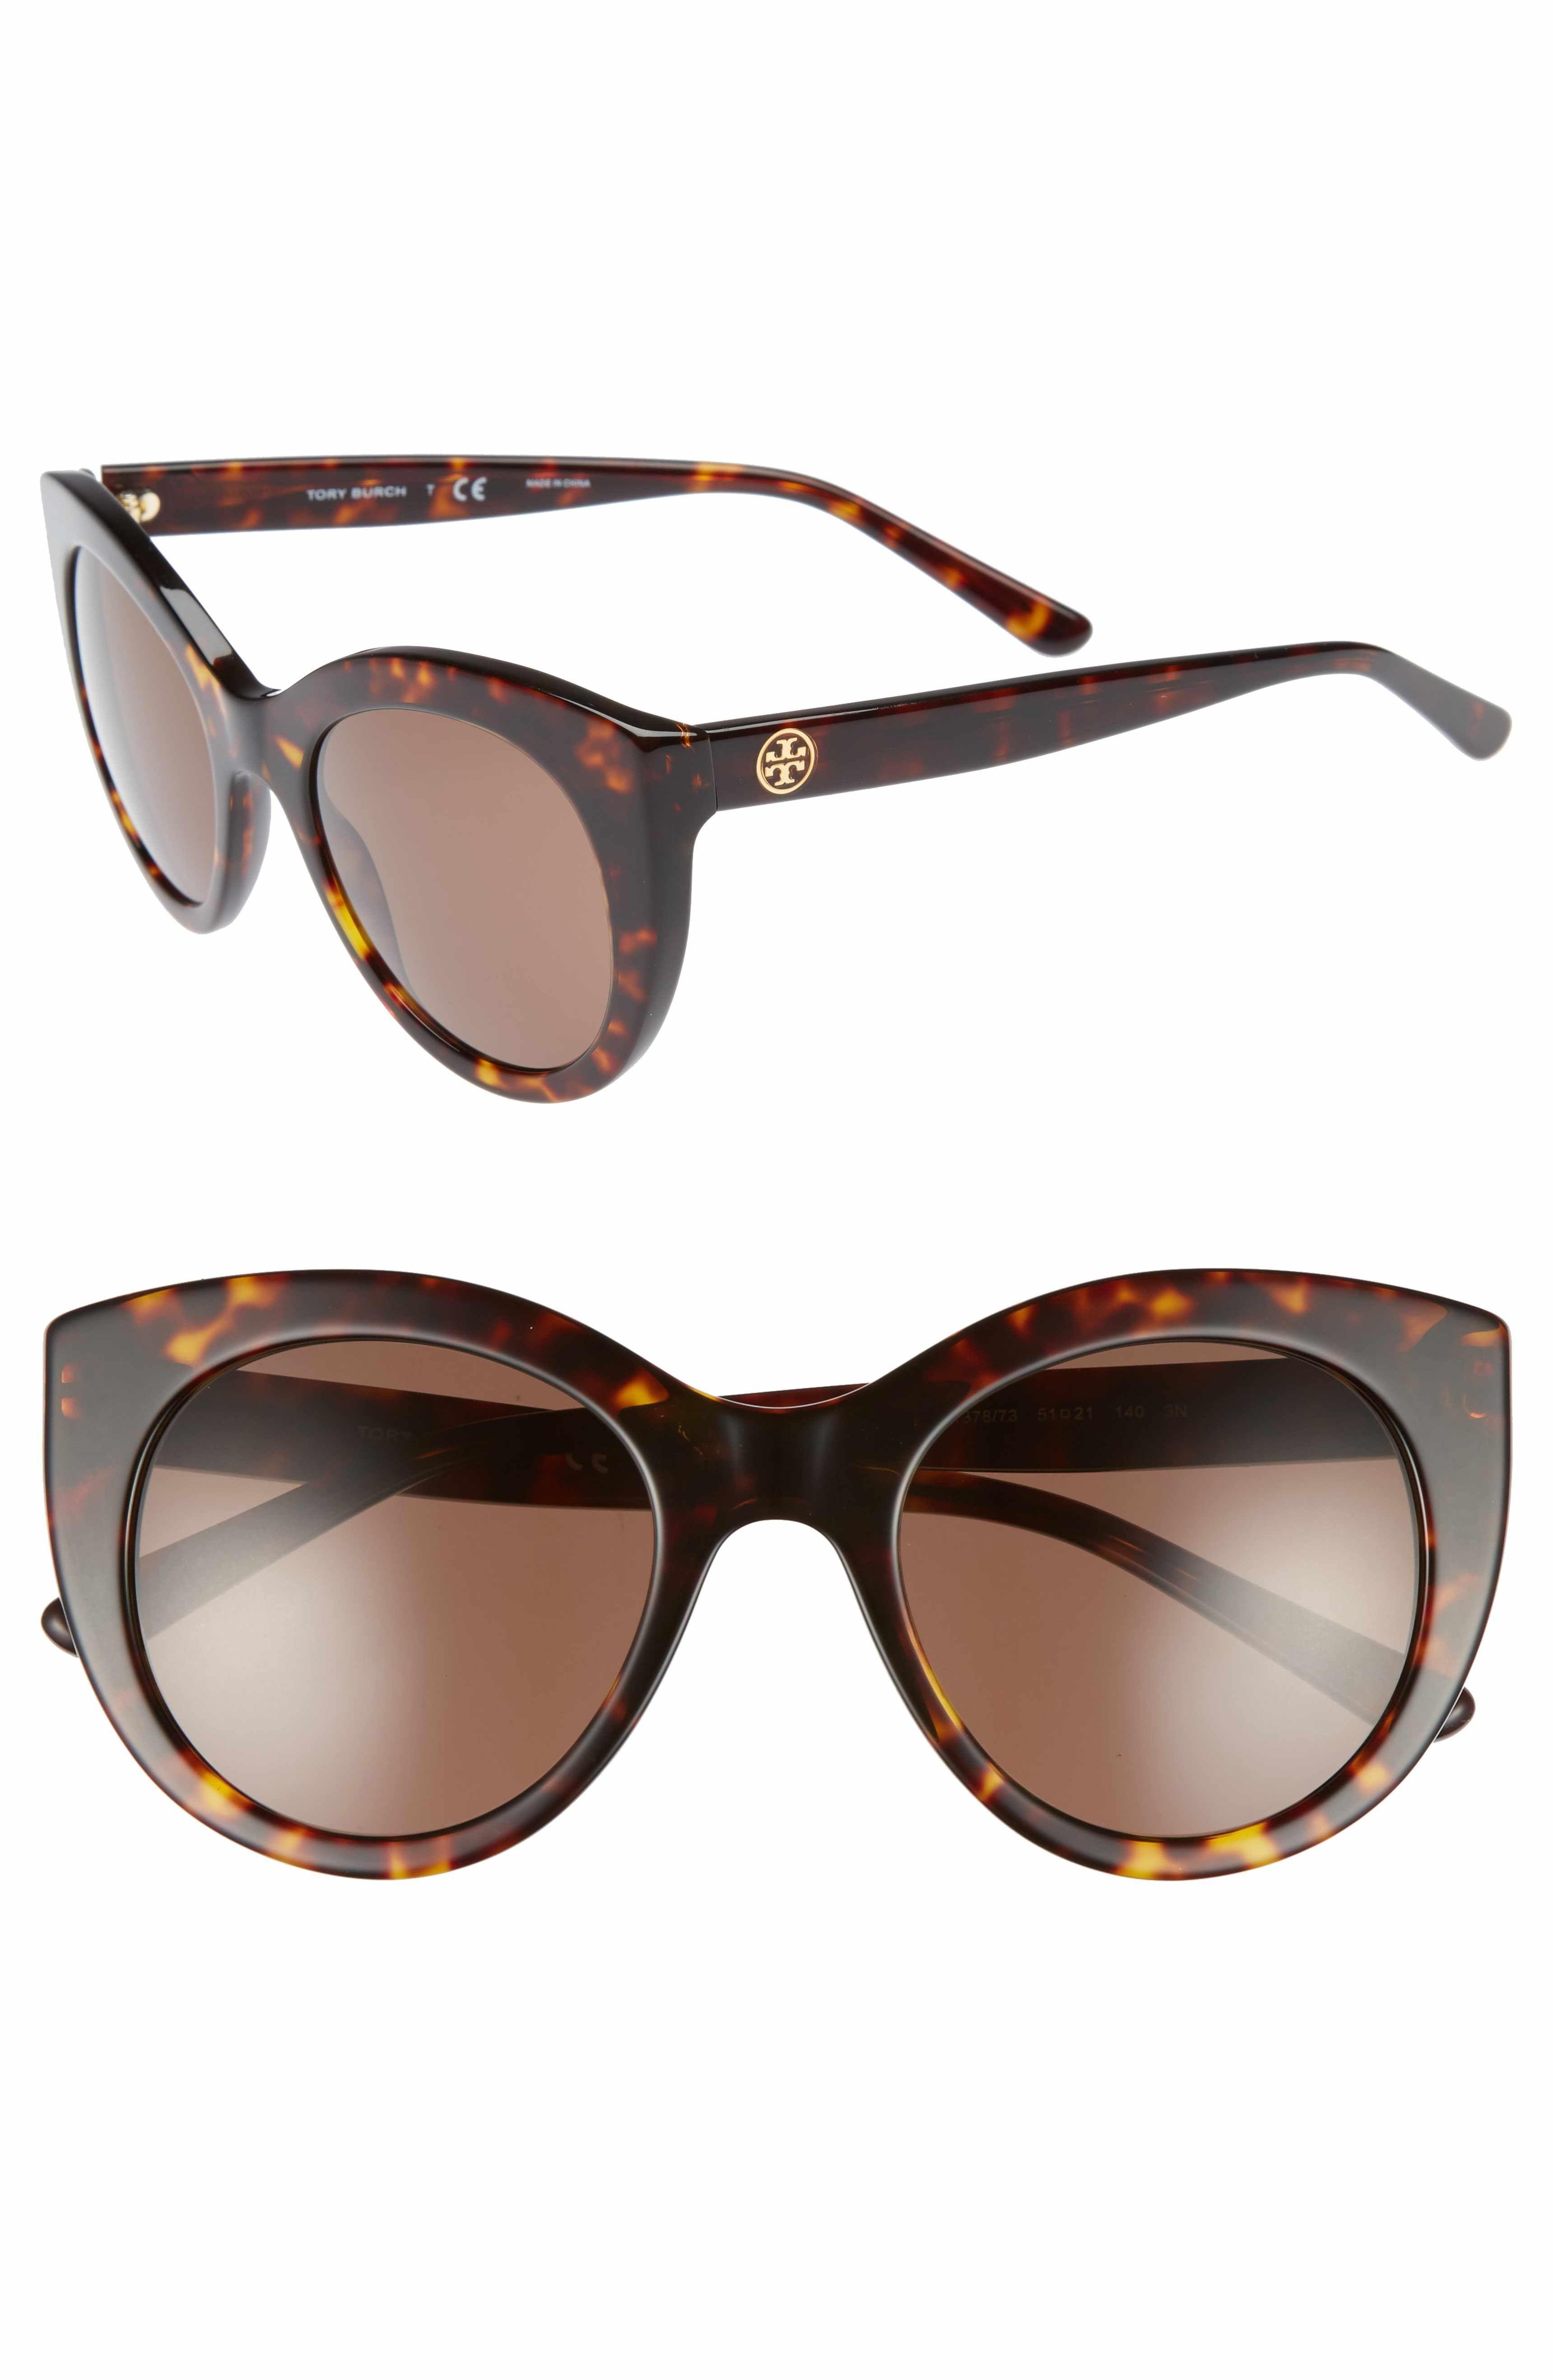 11b631bc640b Main Image - Tory Burch 51mm Cat Eye Sunglasses | Cat eye | Cat eye ...